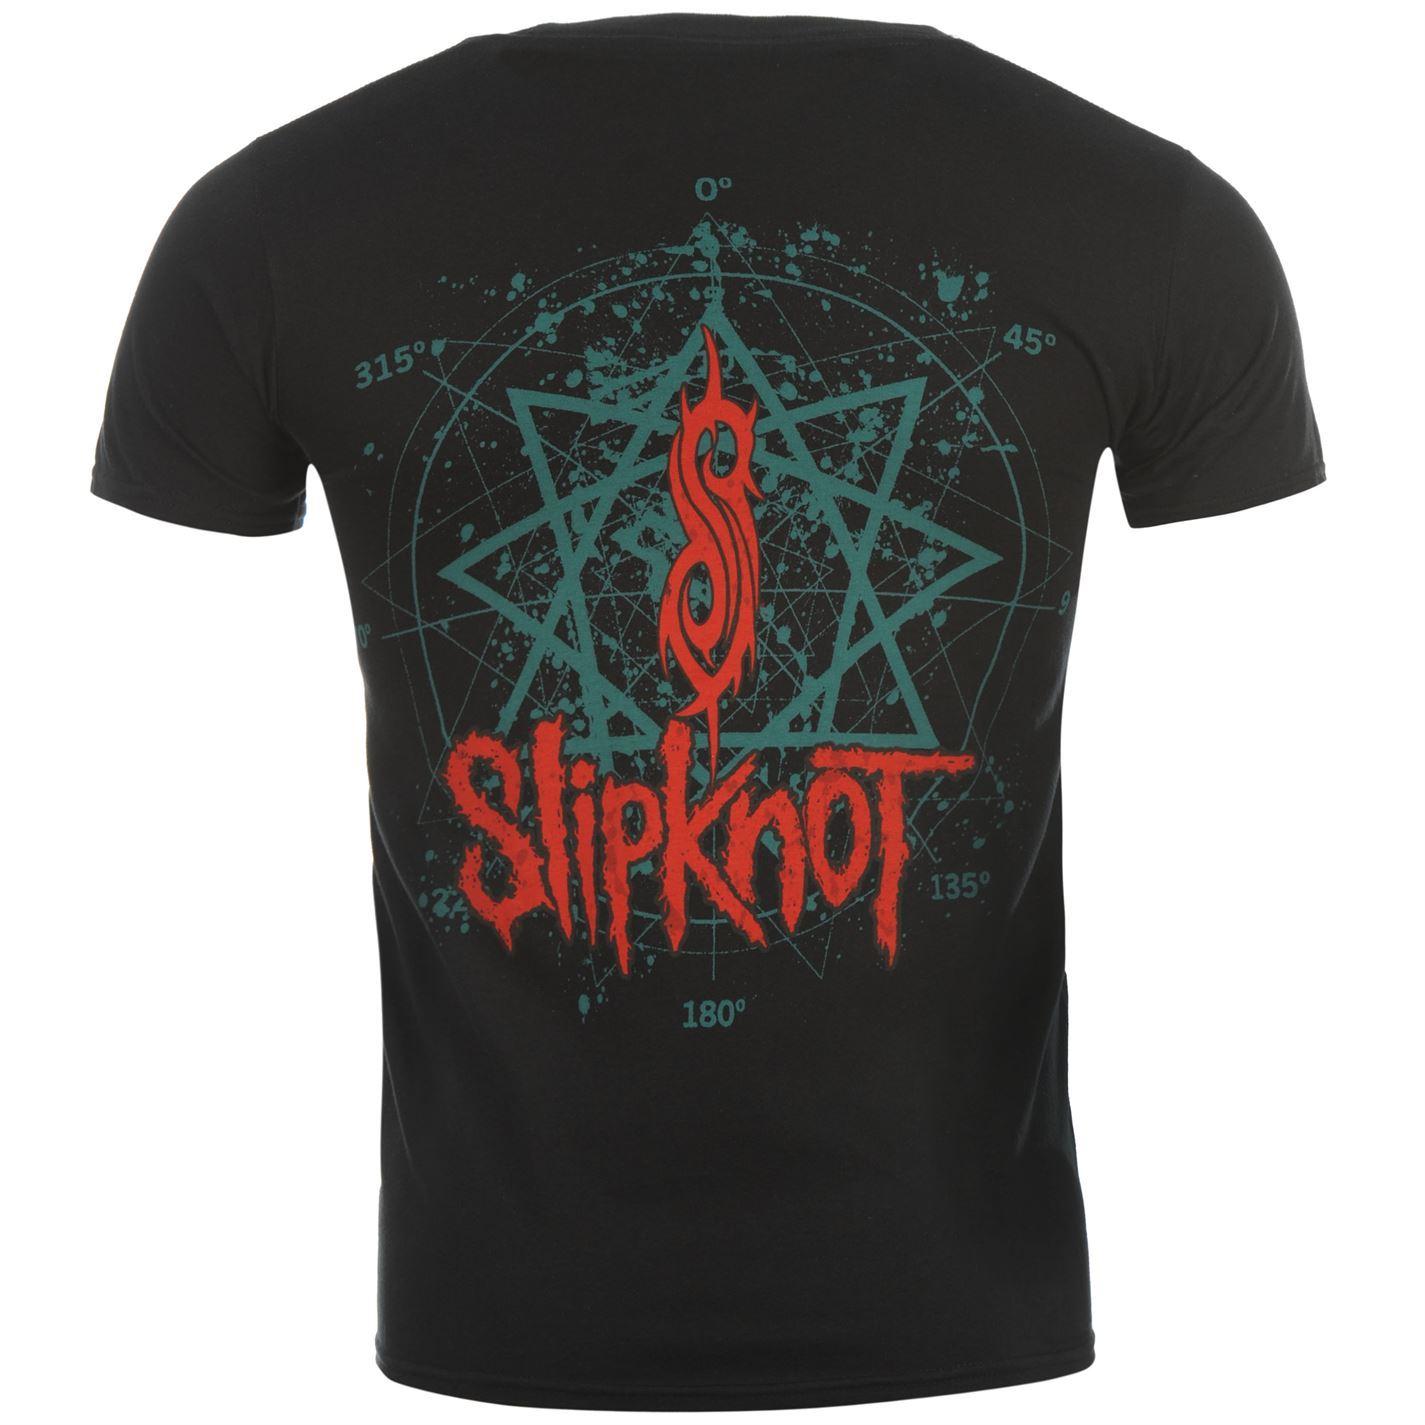 Official-Slipknot-T-Shirt-Mens-Masks-Top-Tee-Tshirt thumbnail 10